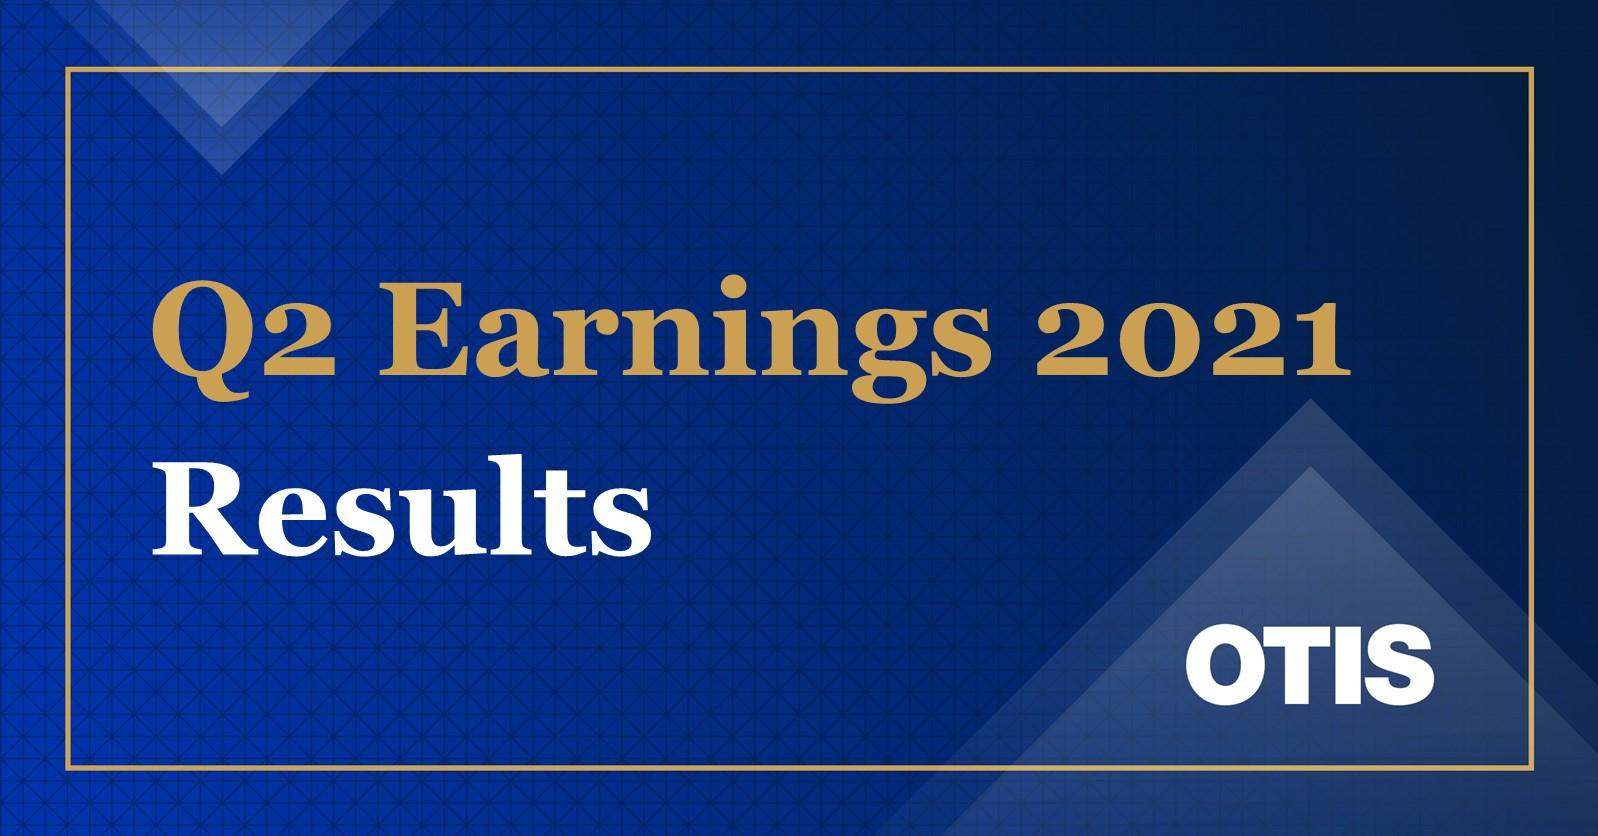 Otis Reports Second Quarter 2021 Results